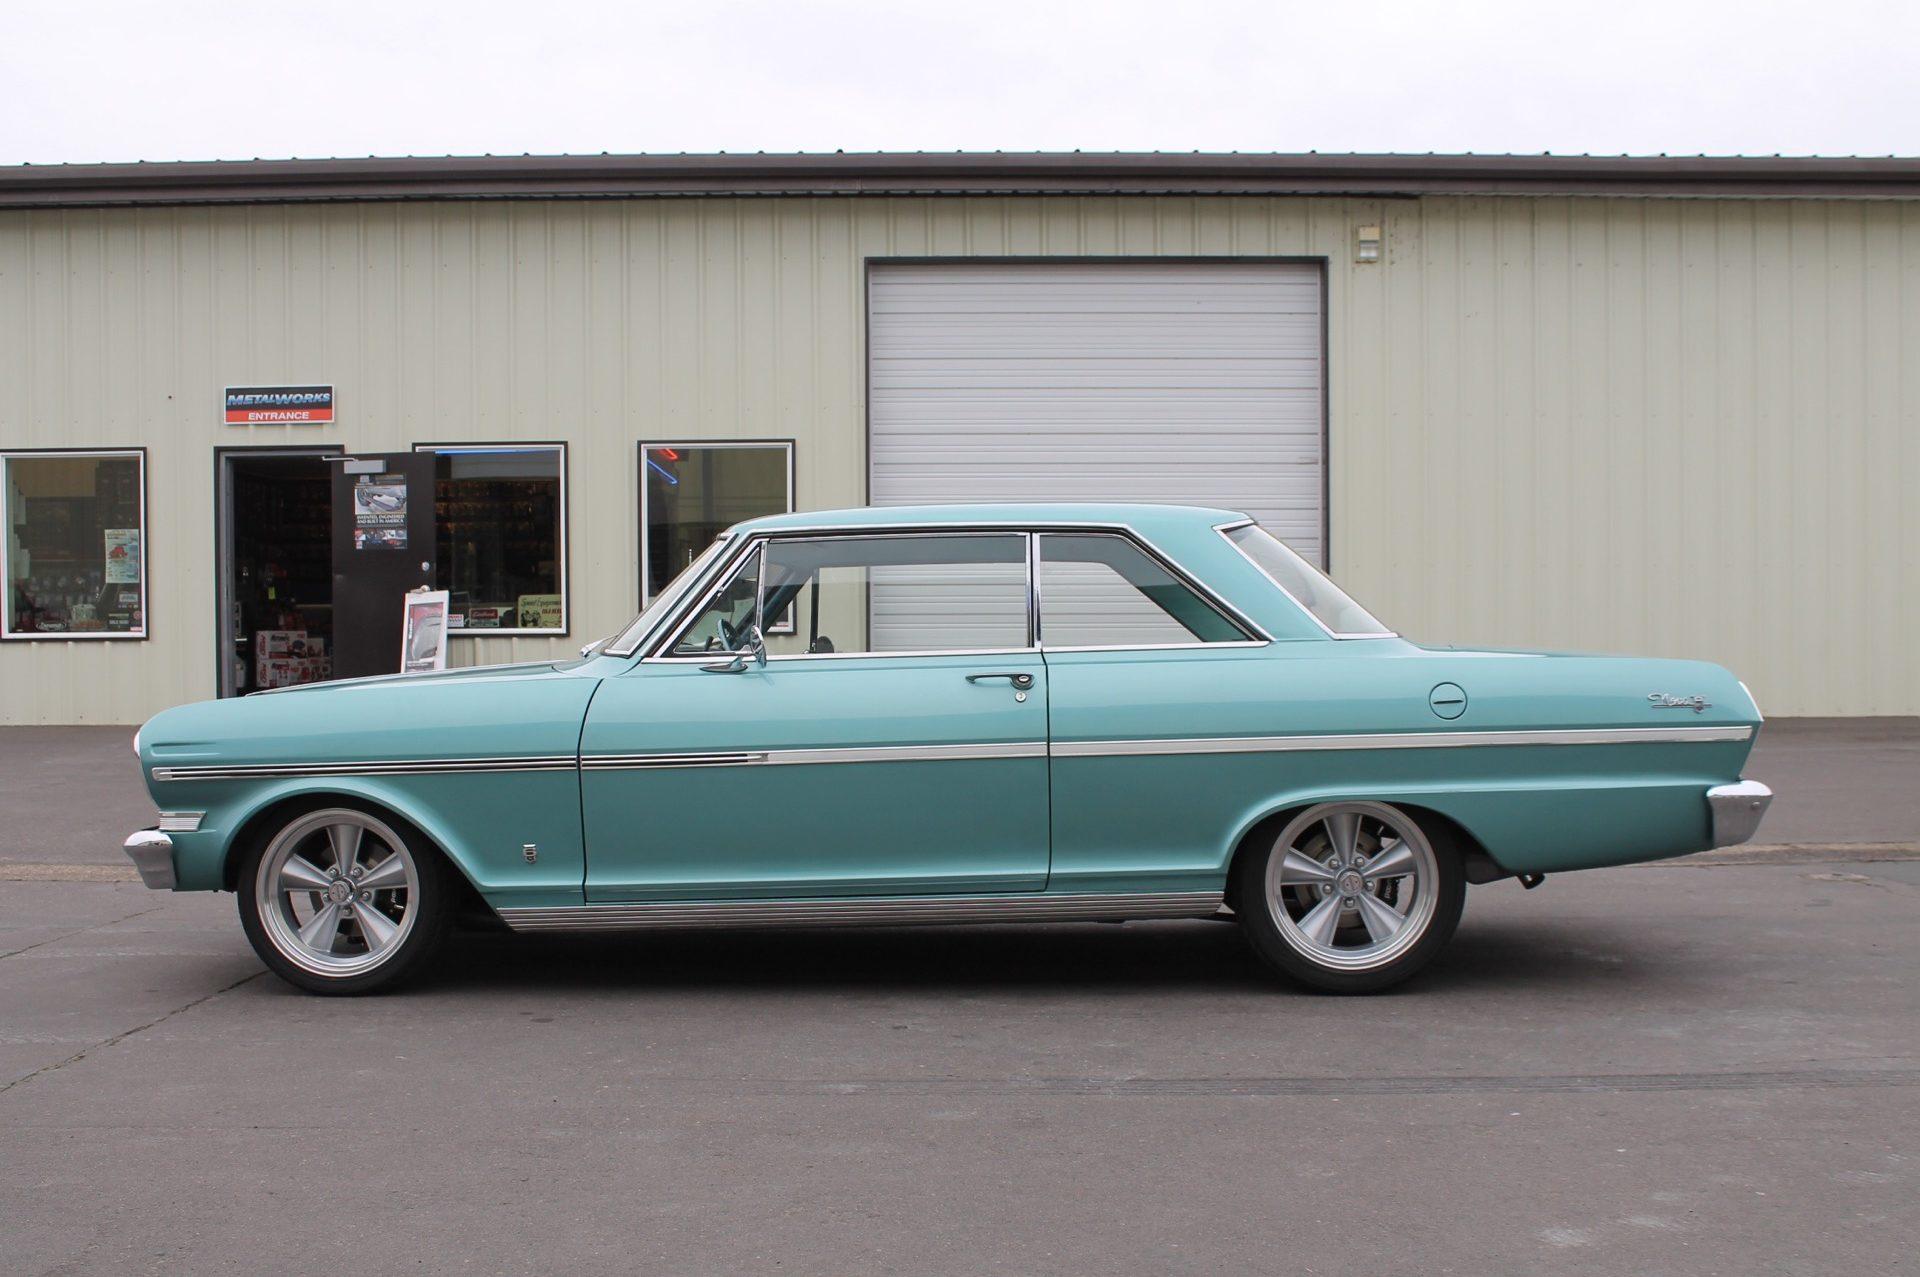 1963 Chevy Nova - MetalWorks Classics Auto Restoration